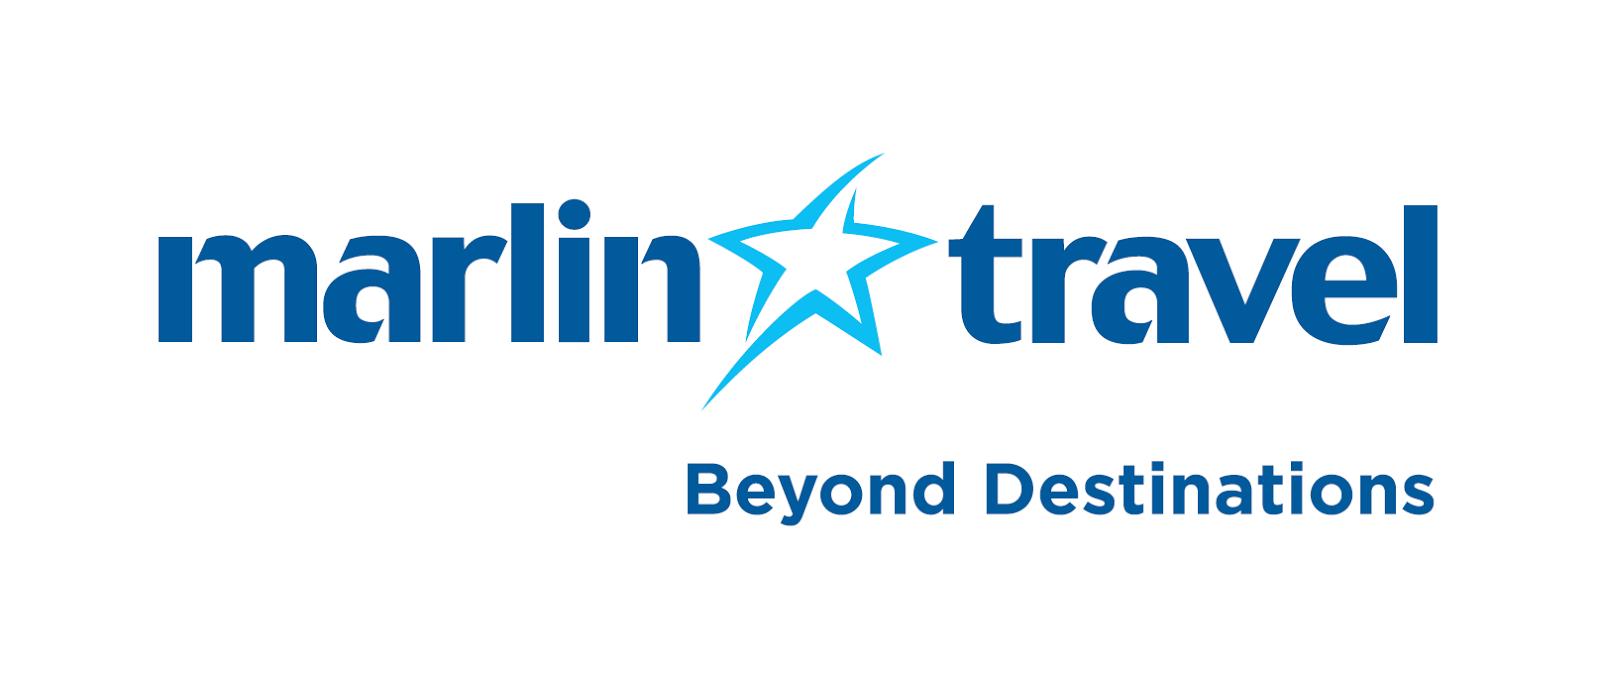 Travel Website Logos  ...